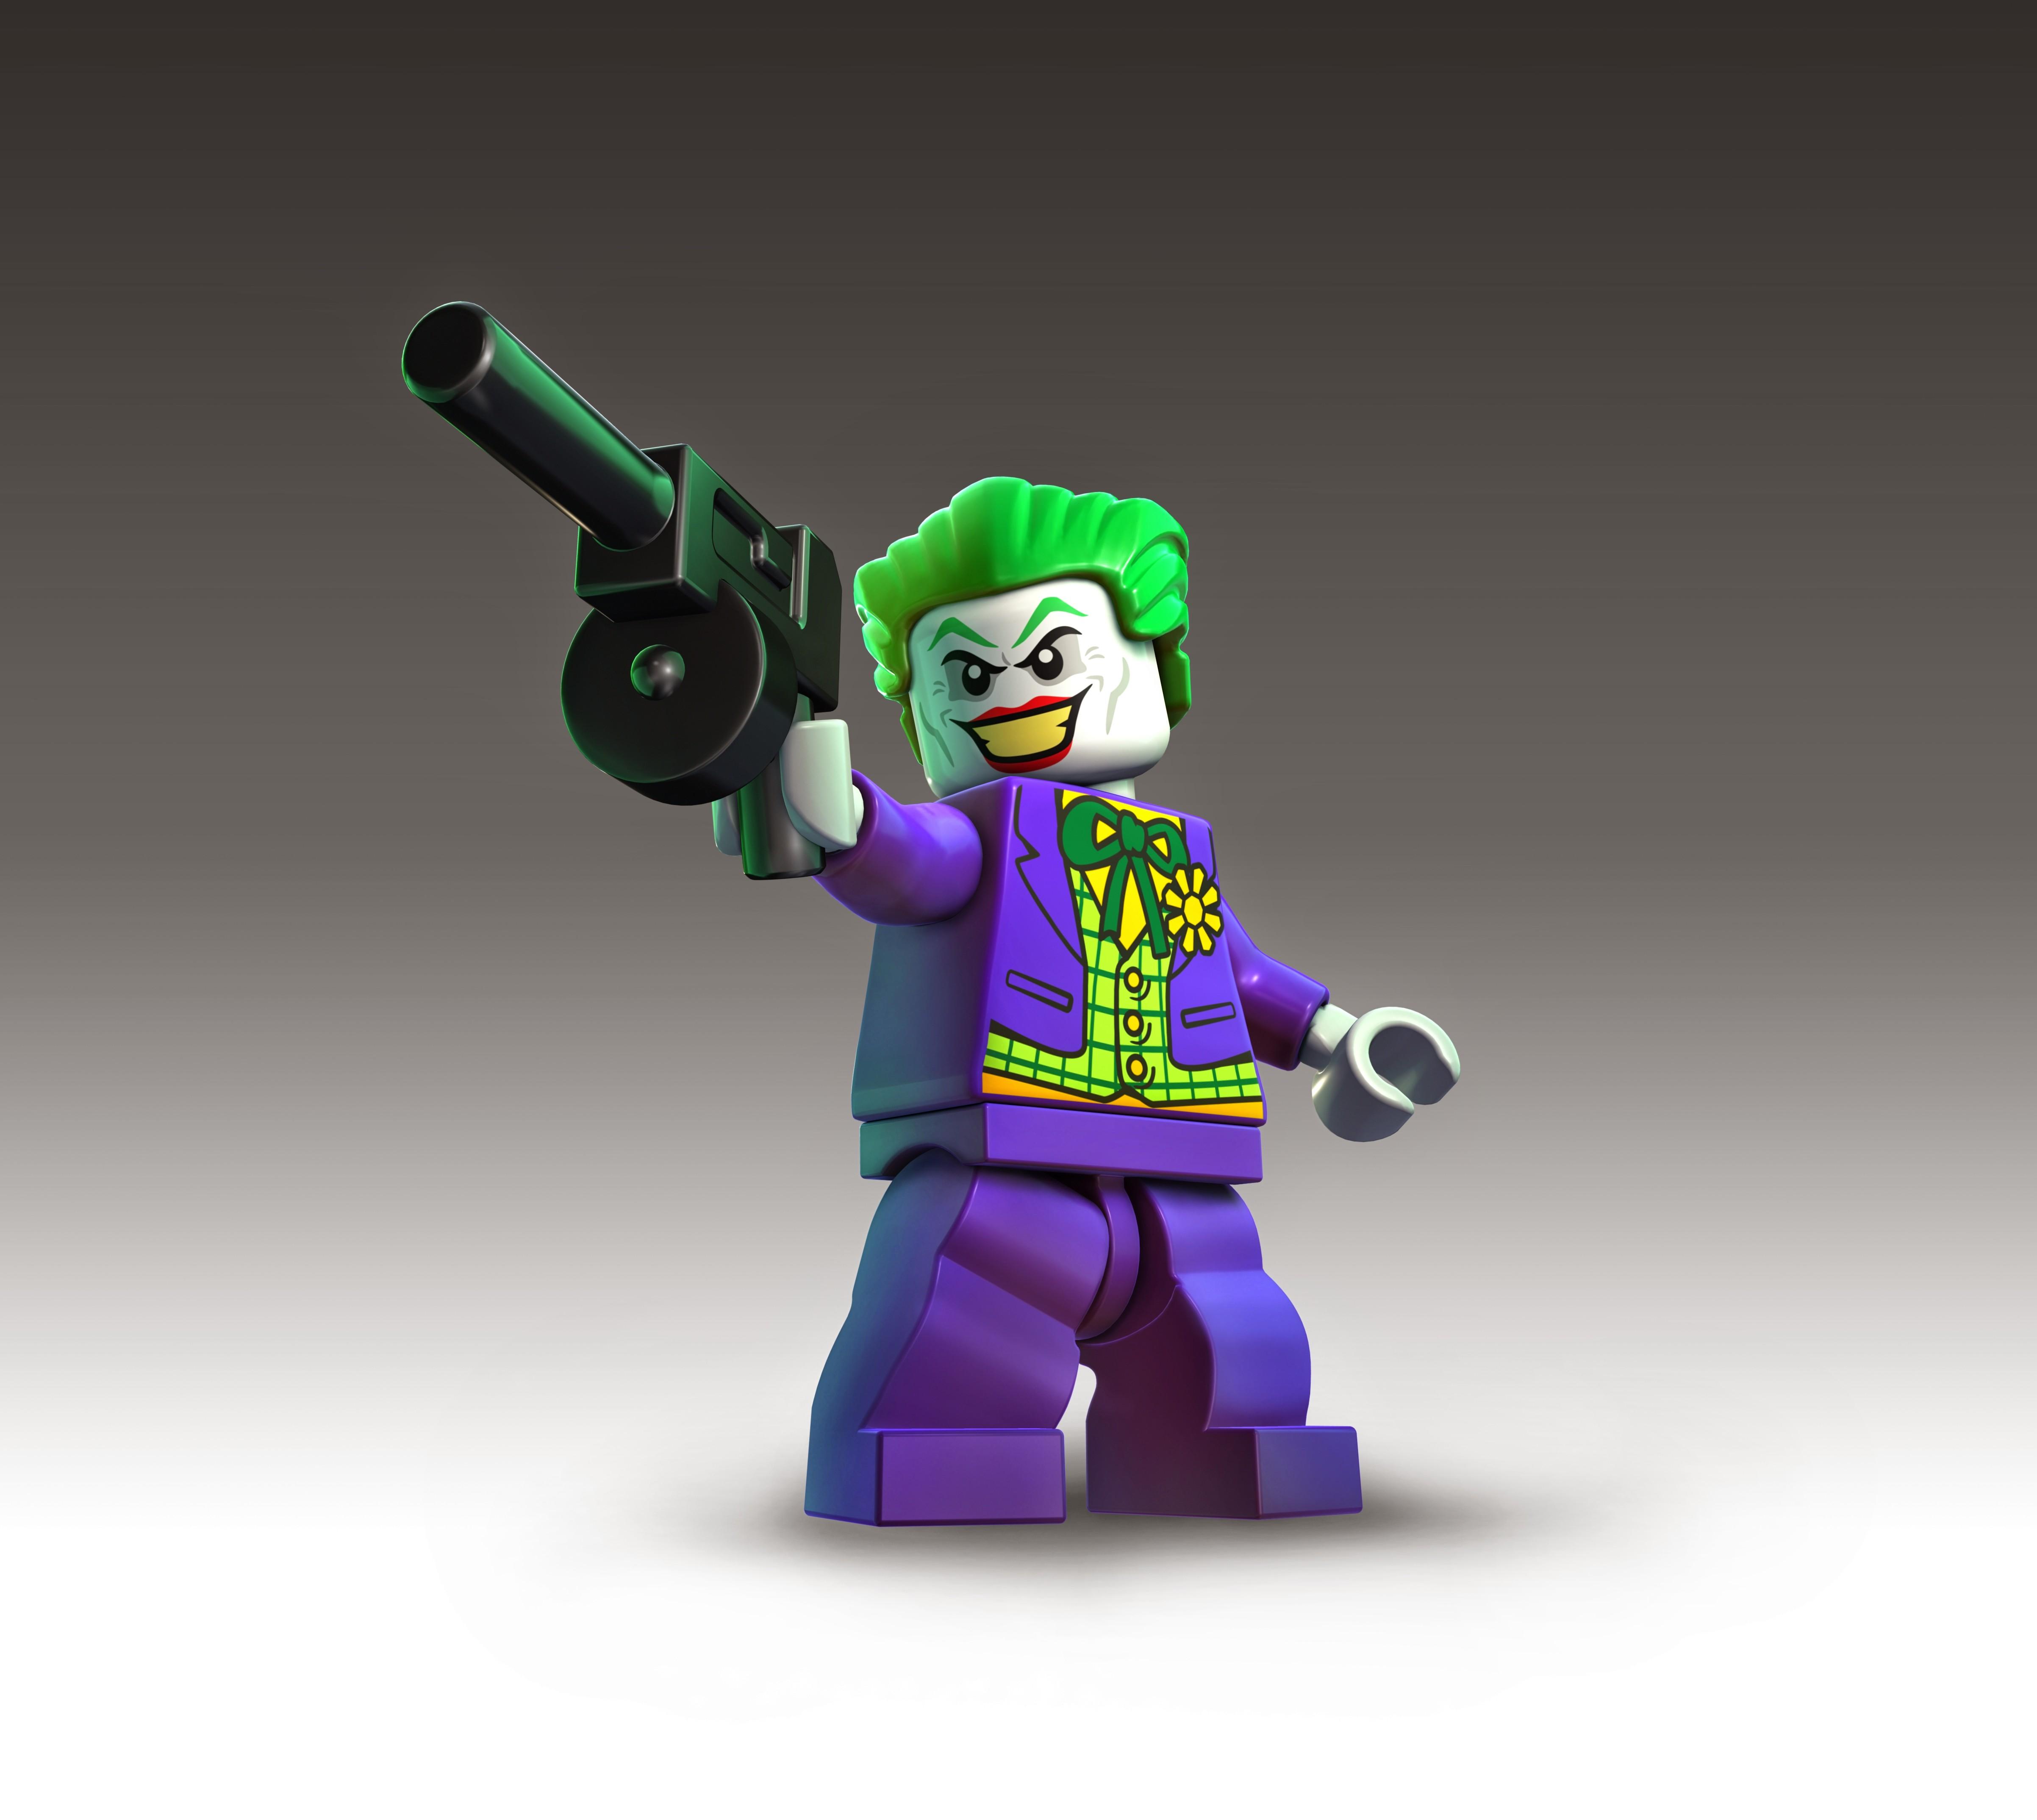 Lego Joker, HD Superheroes, 4k Wallpapers, Images ...